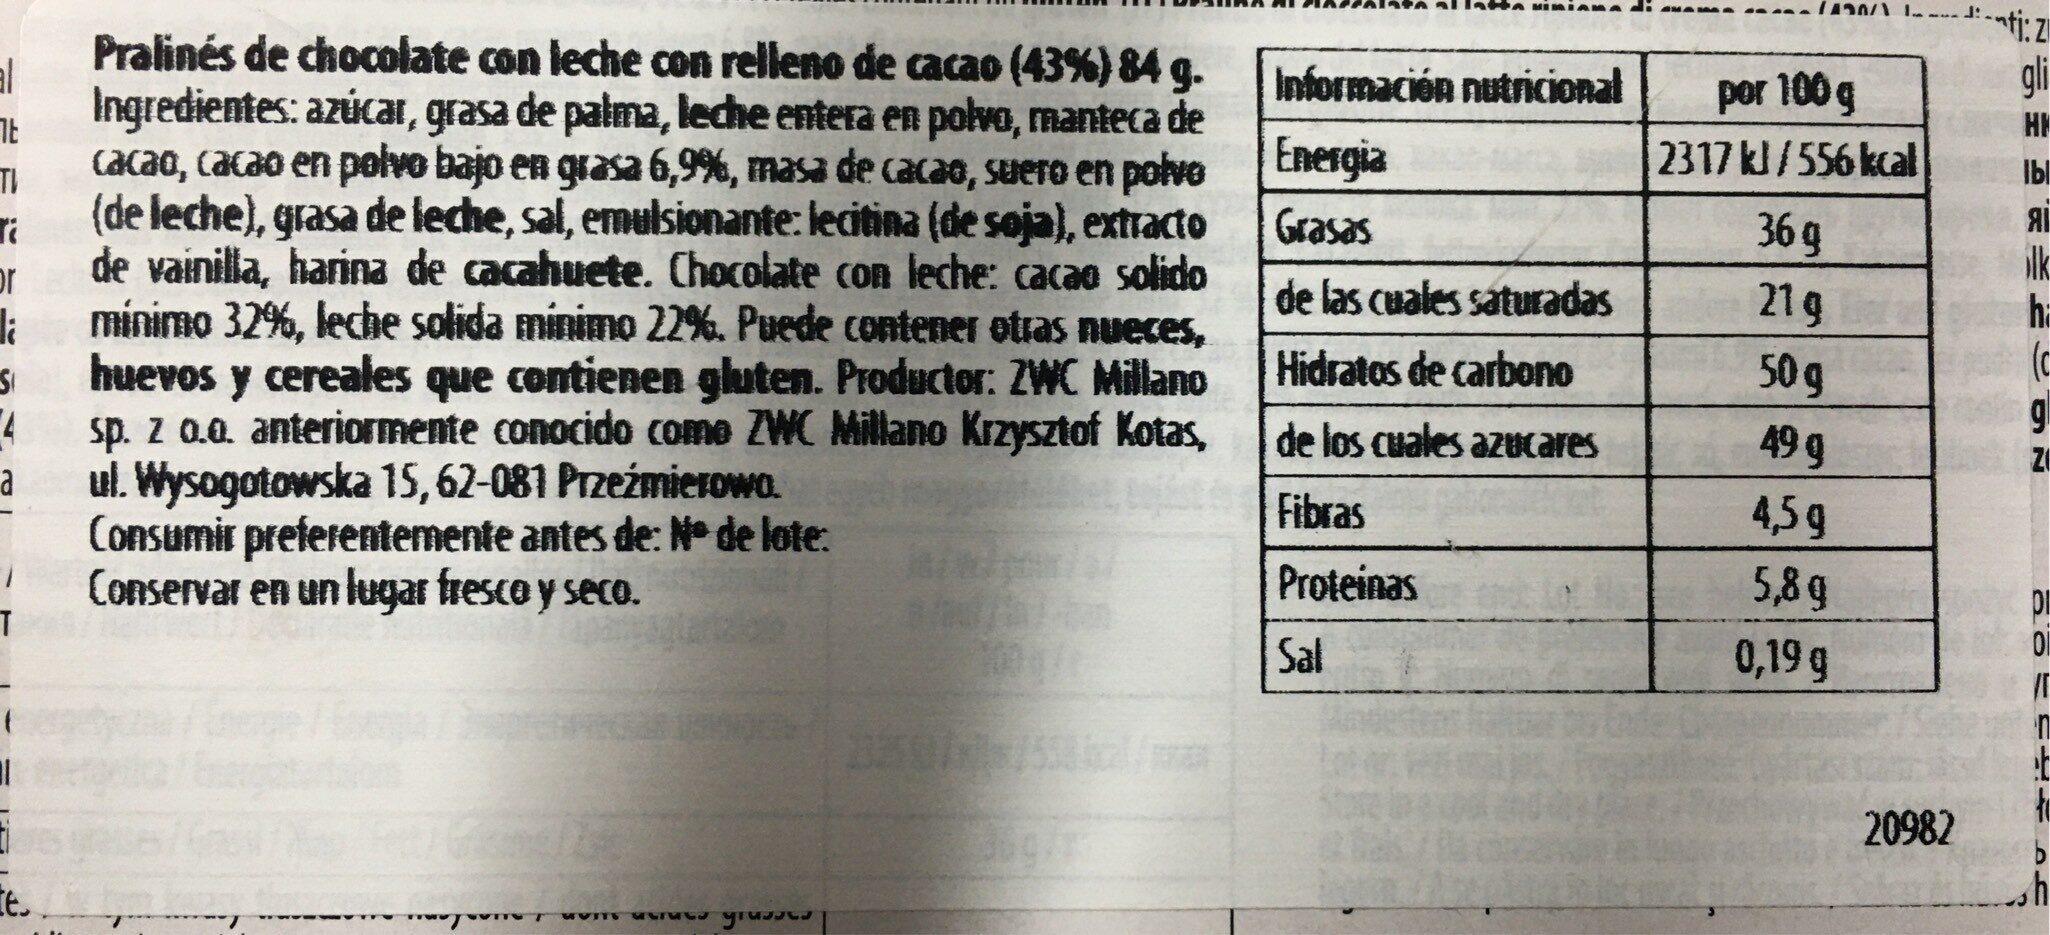 Xocolate - Informations nutritionnelles - es